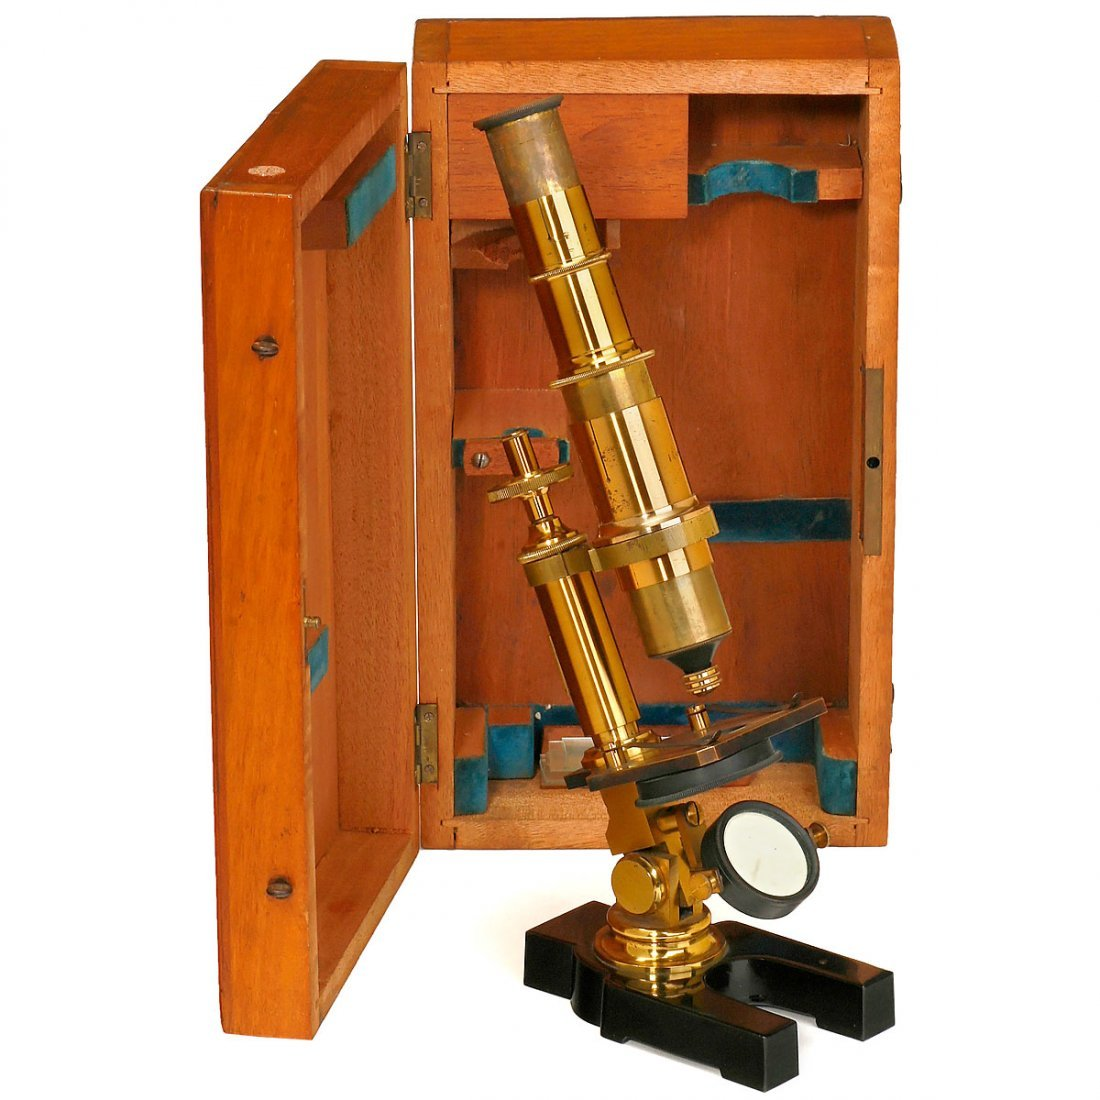 Brass Compound Microscope, c. 1880